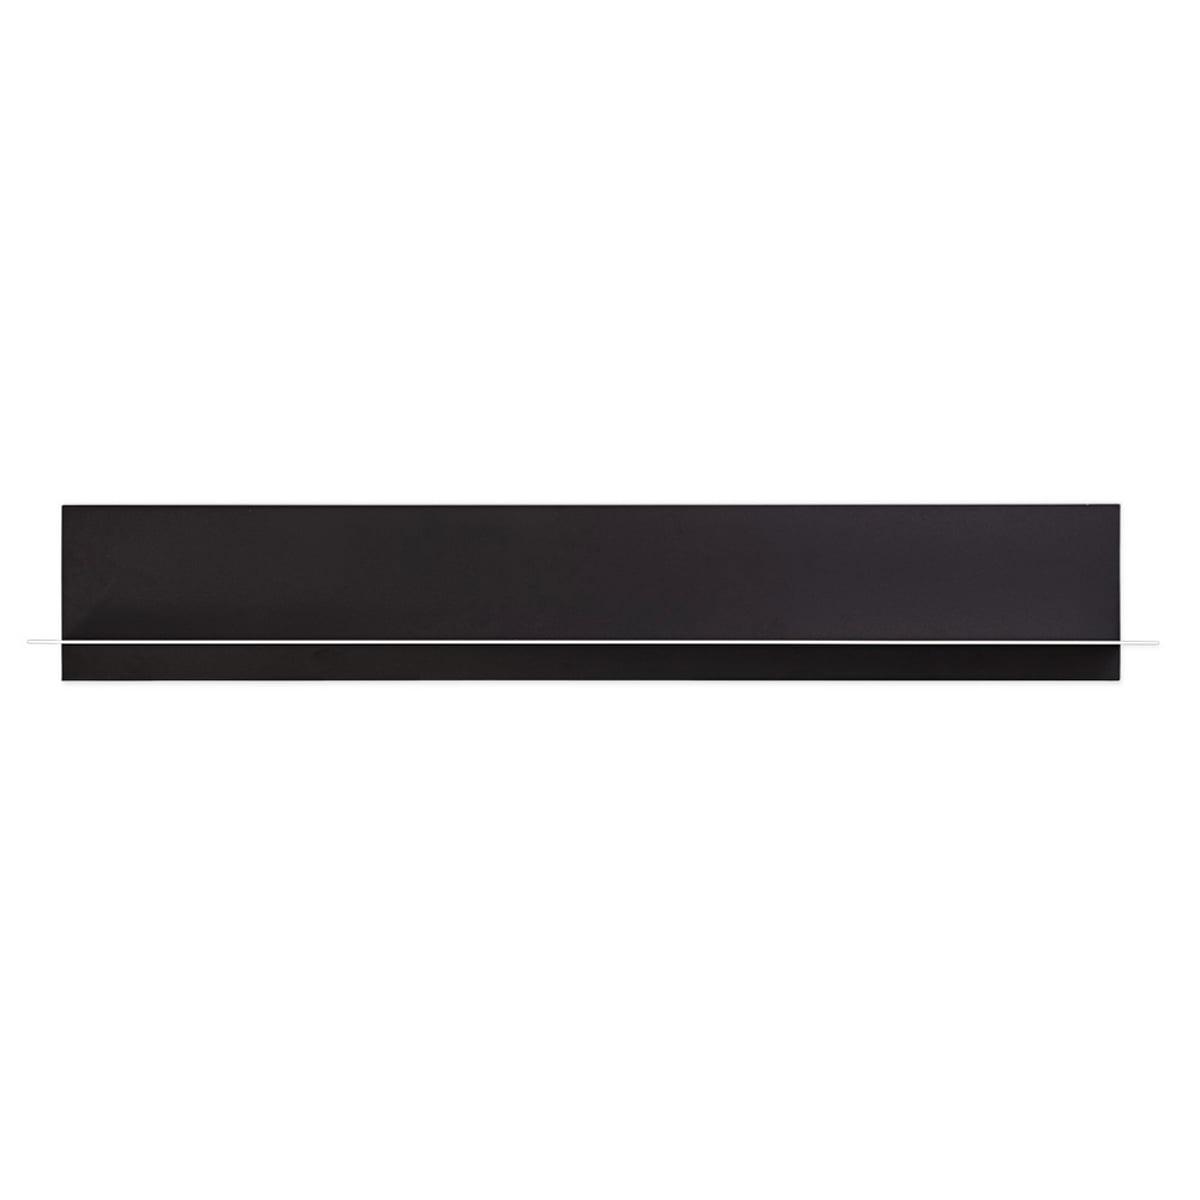 Paper Shelf Wandregal Schwarz A2 Design Letters